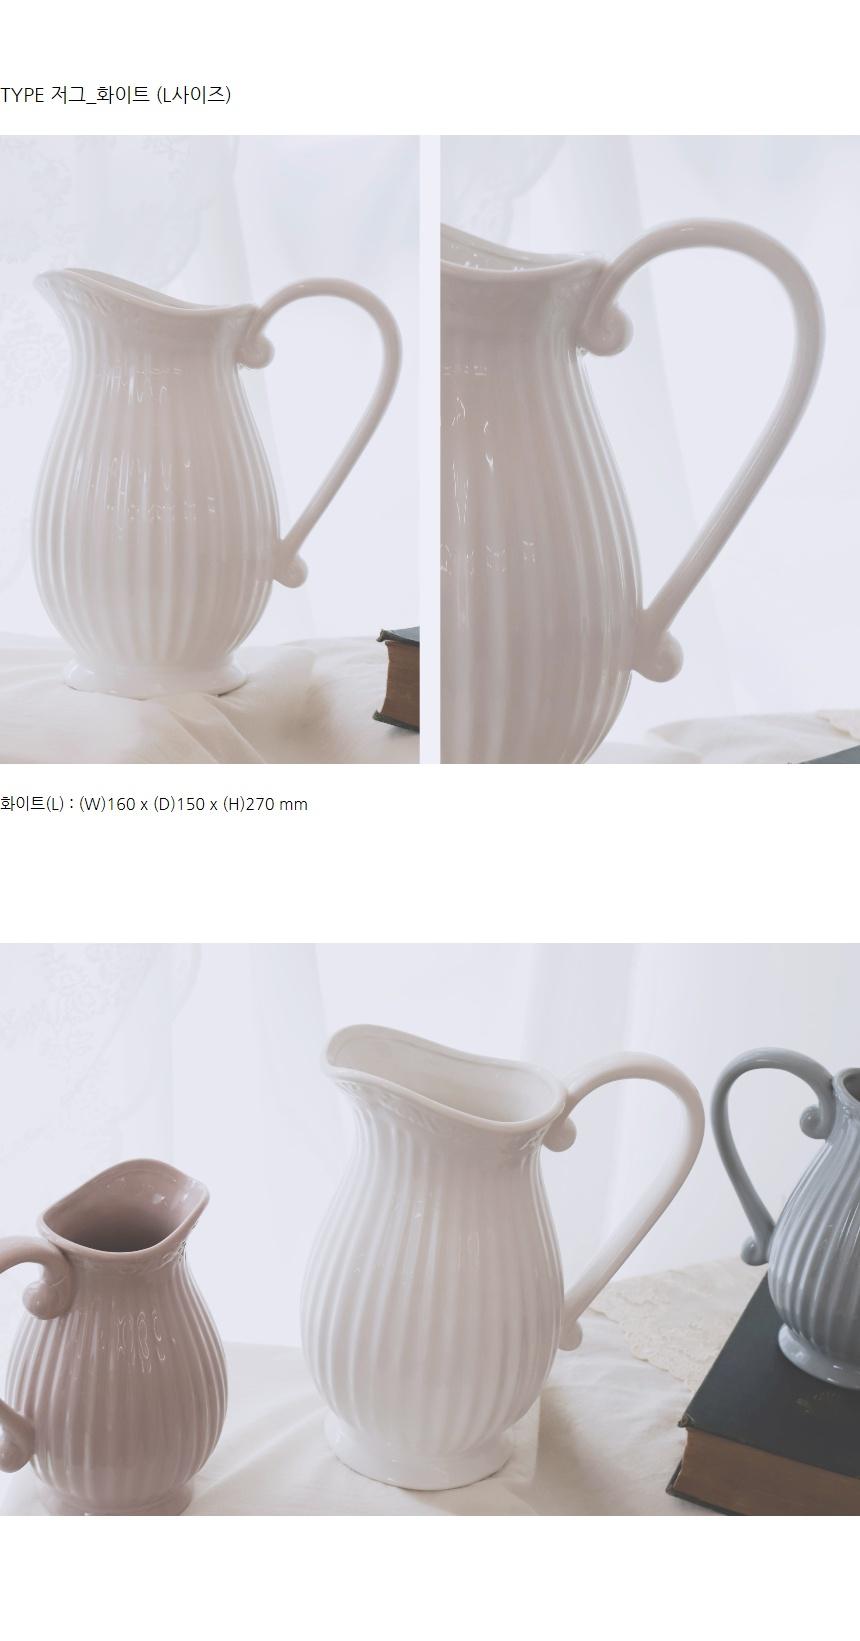 nordic_antique_pottery_vase_06.jpg